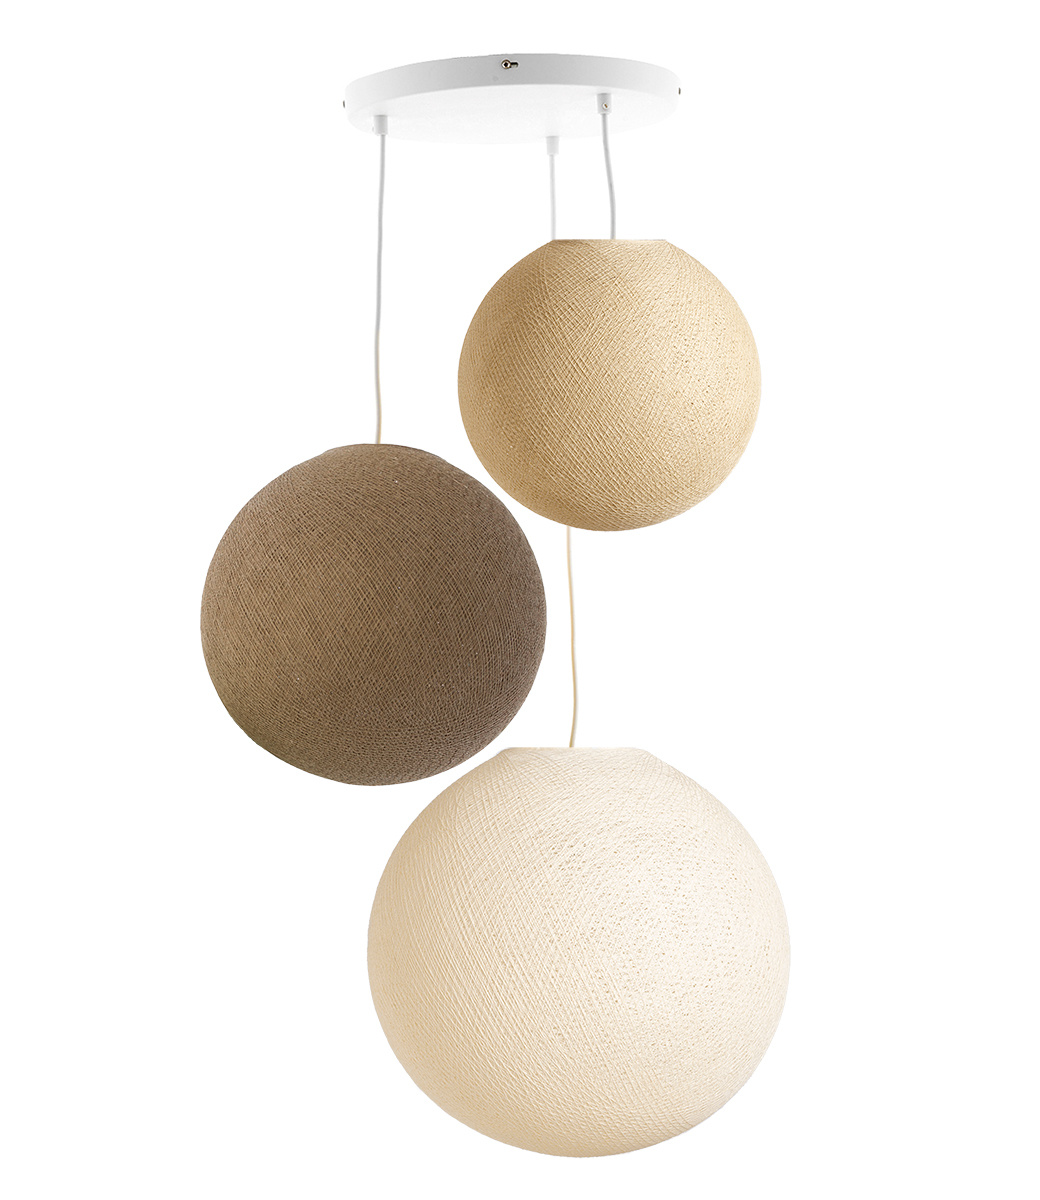 Drievoudige hanglamp 3 punt - Calme Sense